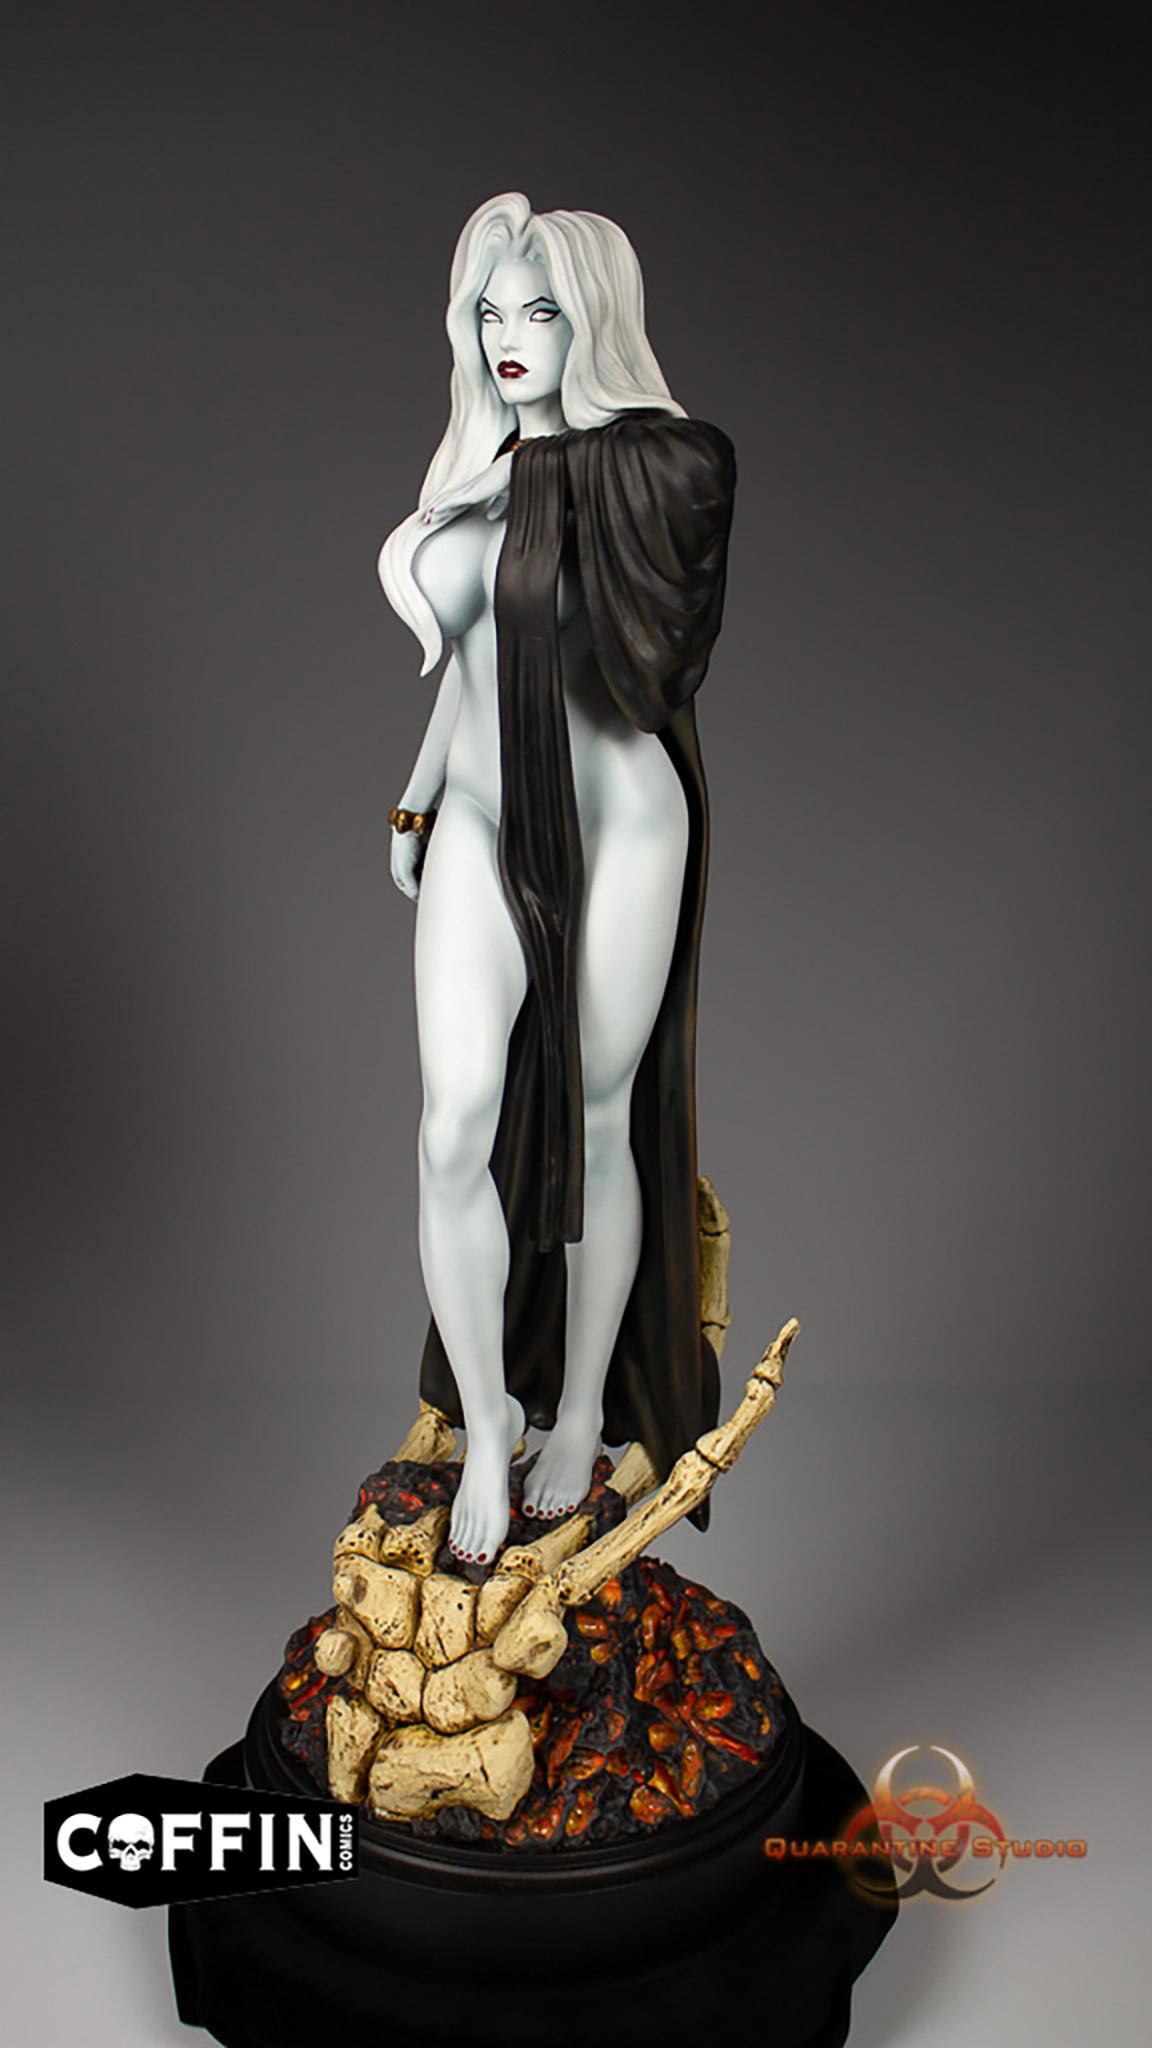 Quarantine Studios Lady Death: Seductress Lady Death 1:6 Scale Statue